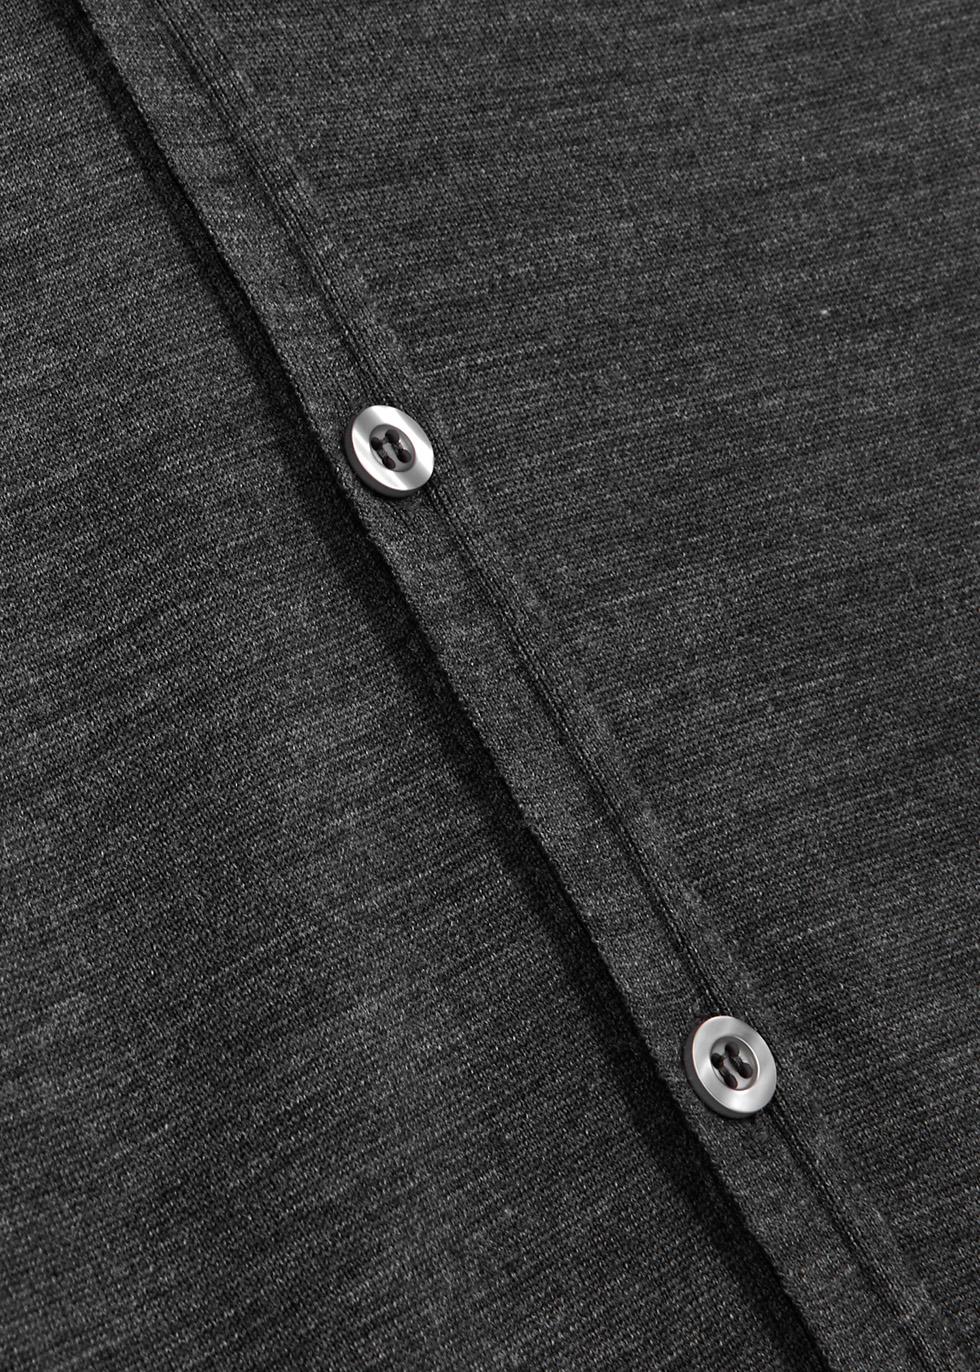 Petworth charcoal wool cardigan - John Smedley